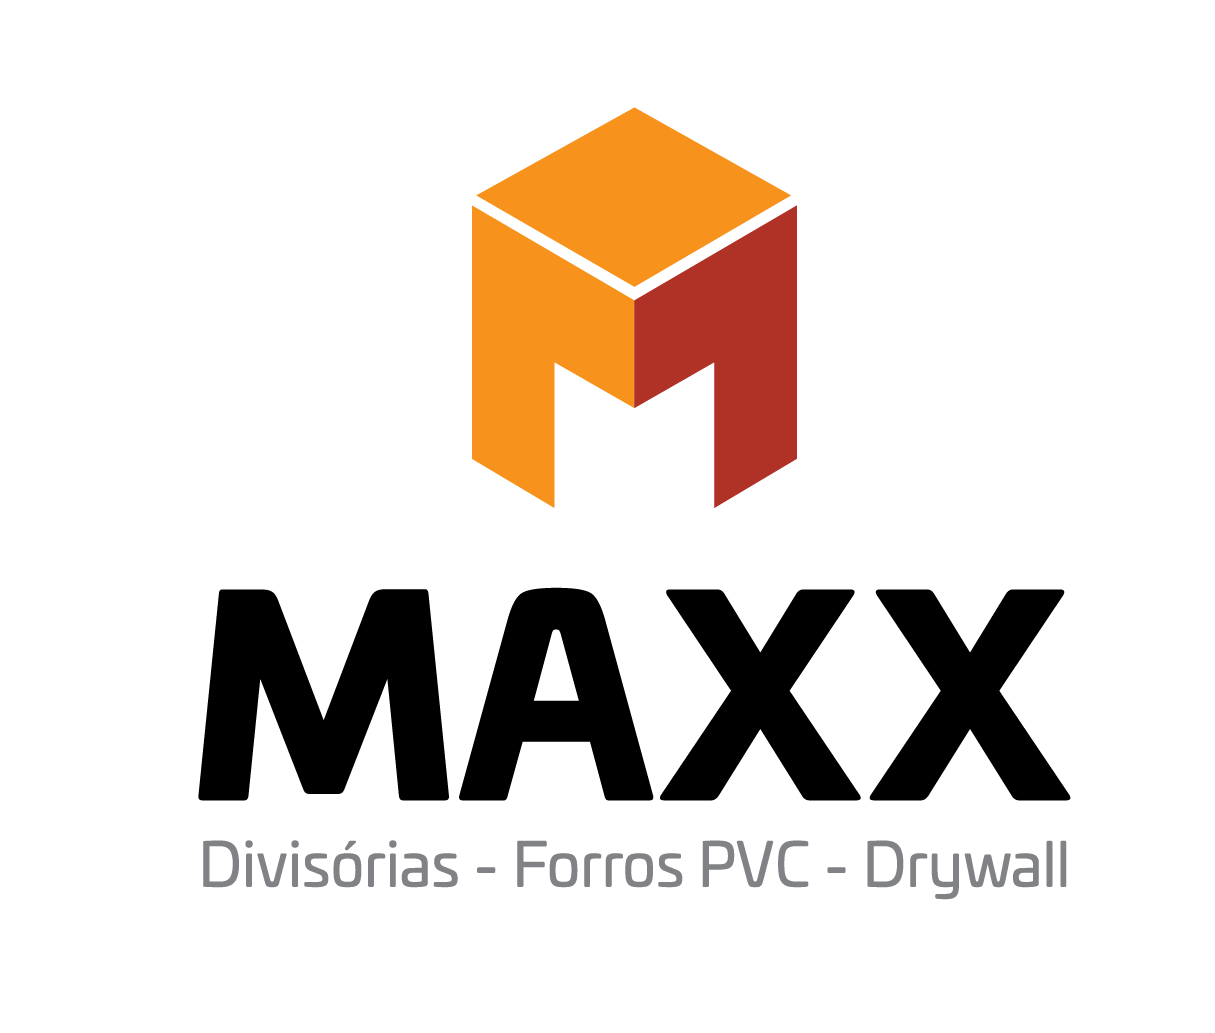 divisória bloco de gesso - Maxx Forro